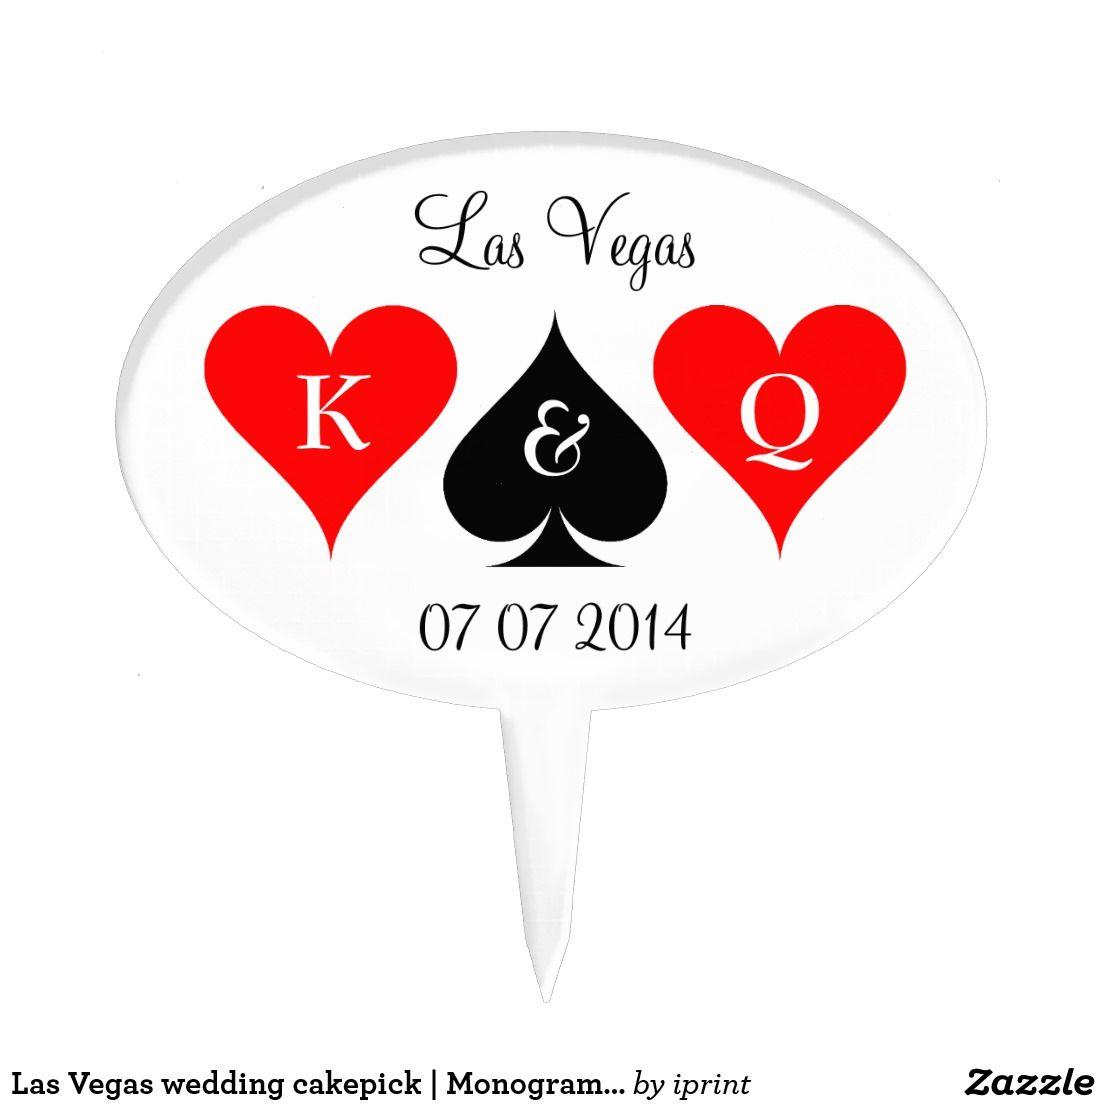 Las Vegas wedding cakepick | Monogram cake topper | Monogram cake ...